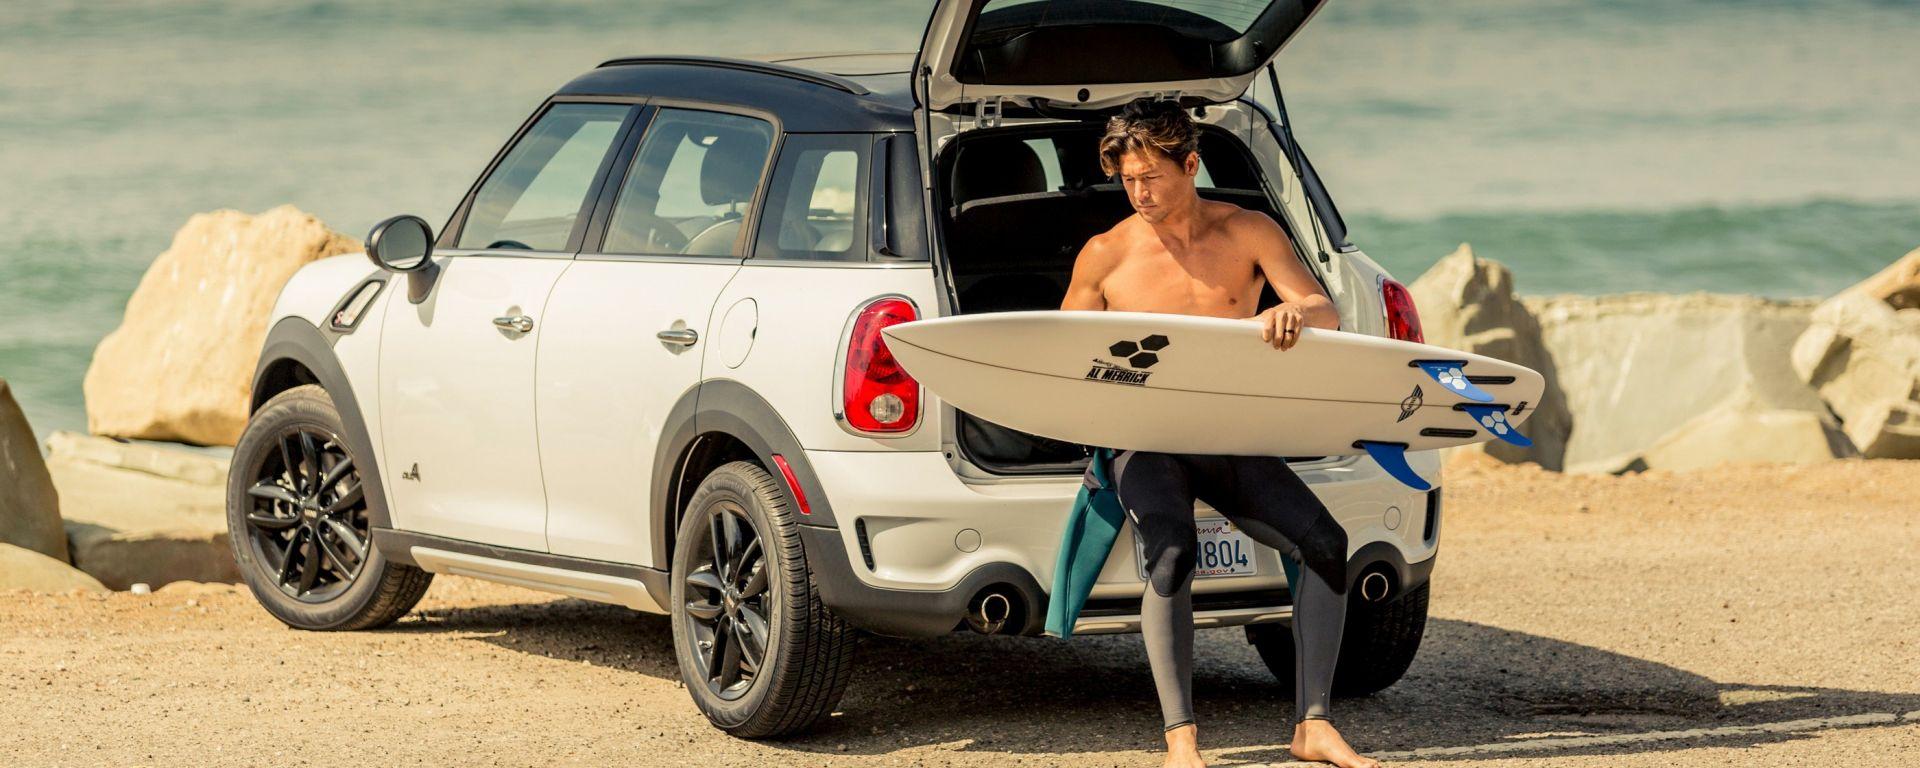 Curiosit the mini la tavola da surf firmata mini motorbox - Tavola da surf motorizzata prezzo ...